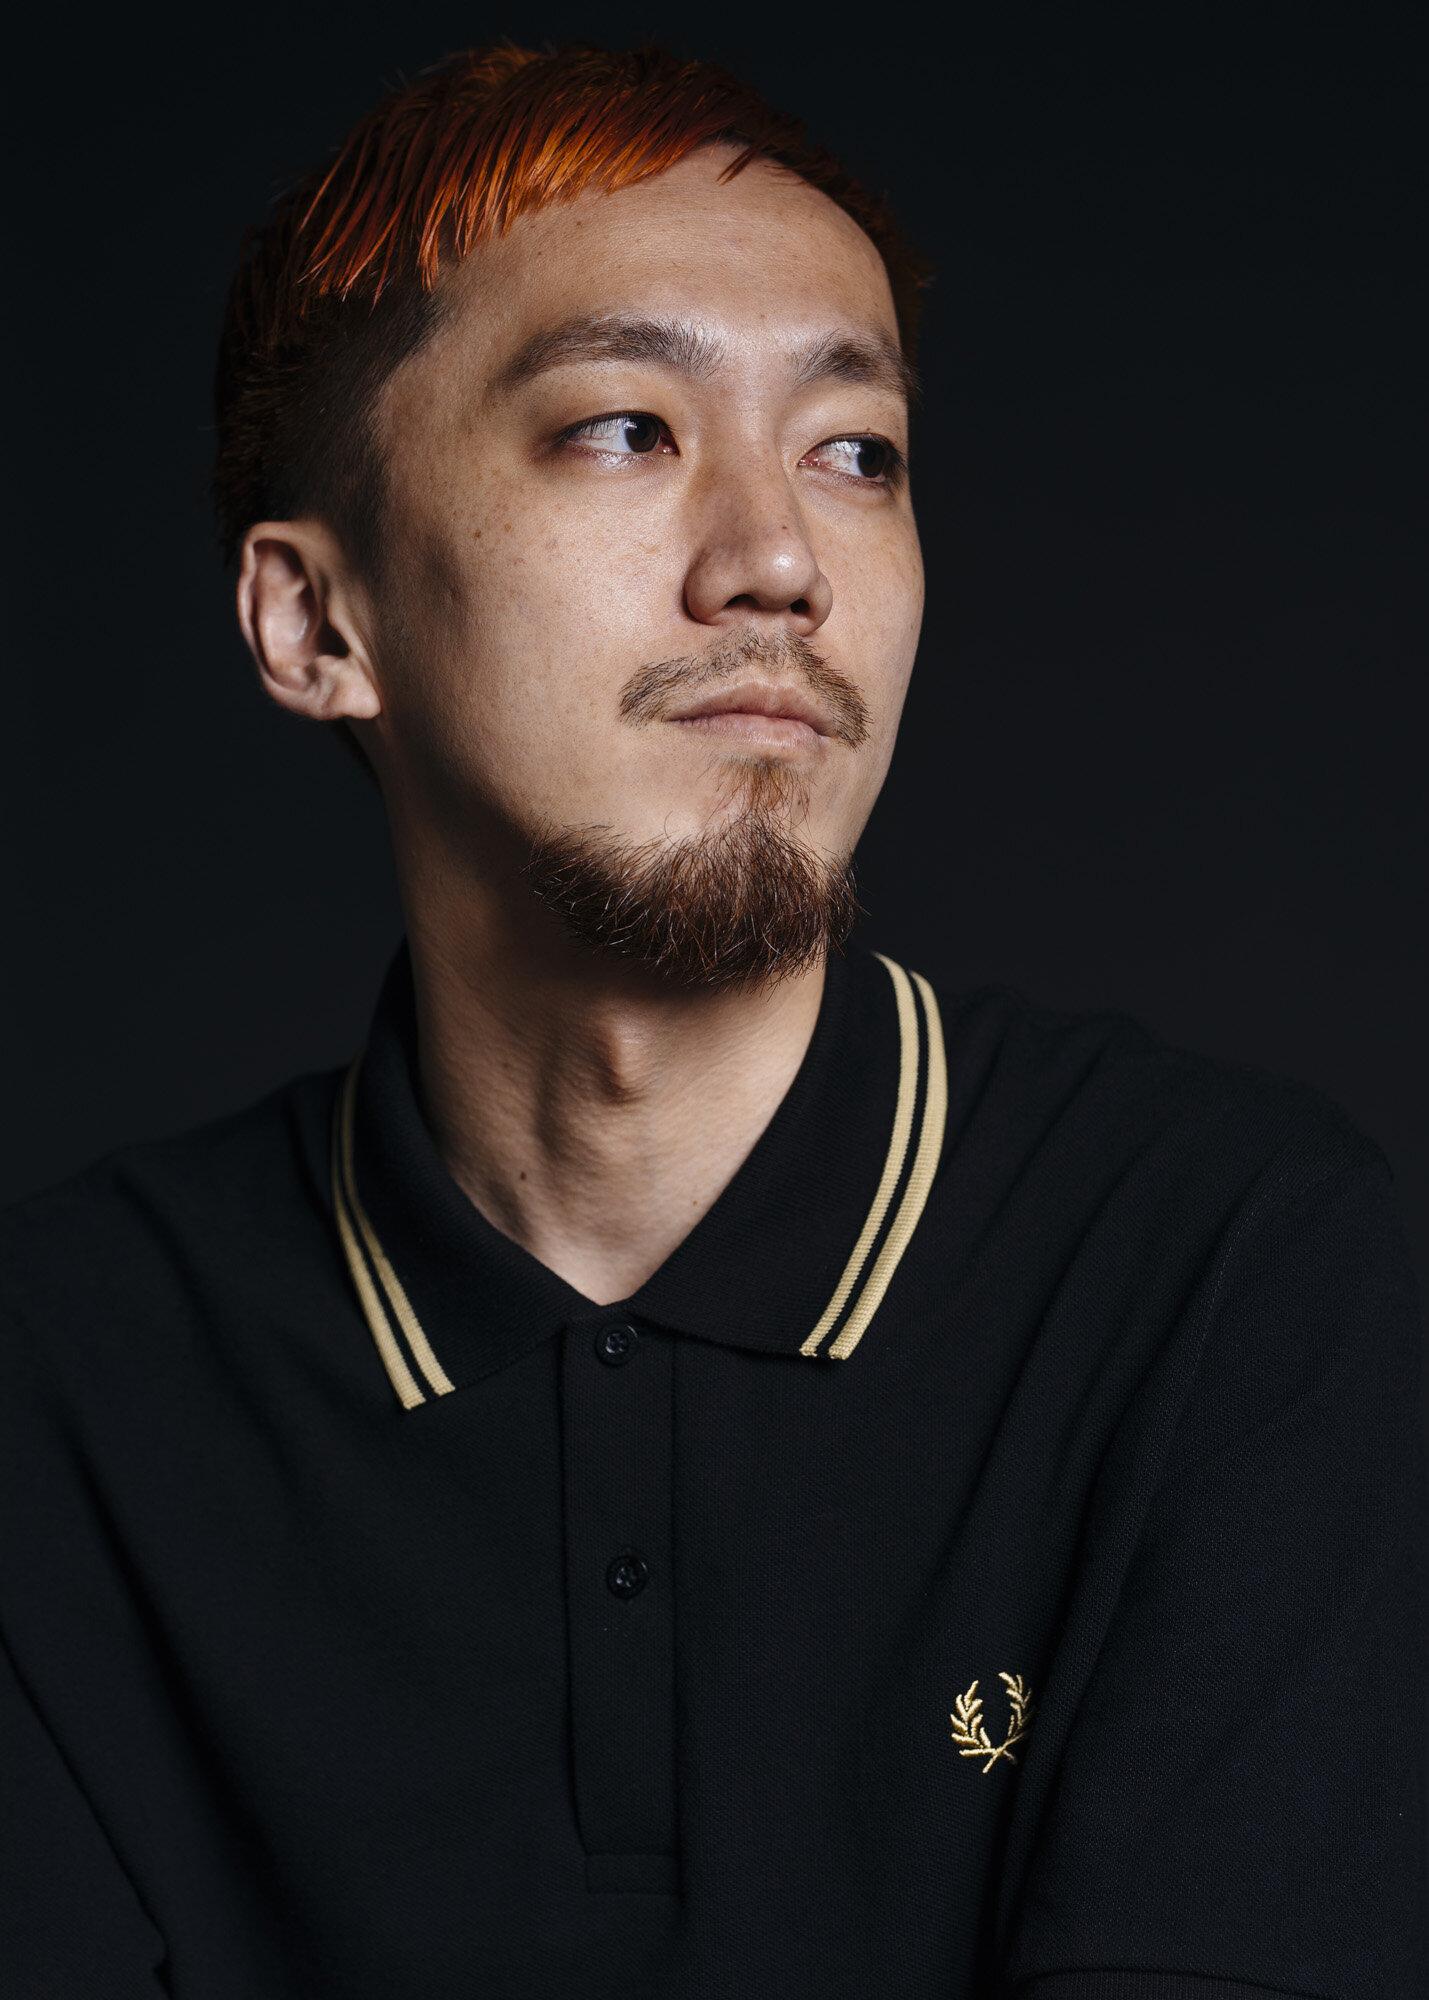 Fred Perry - Koji Kawasaki - 1.jpg